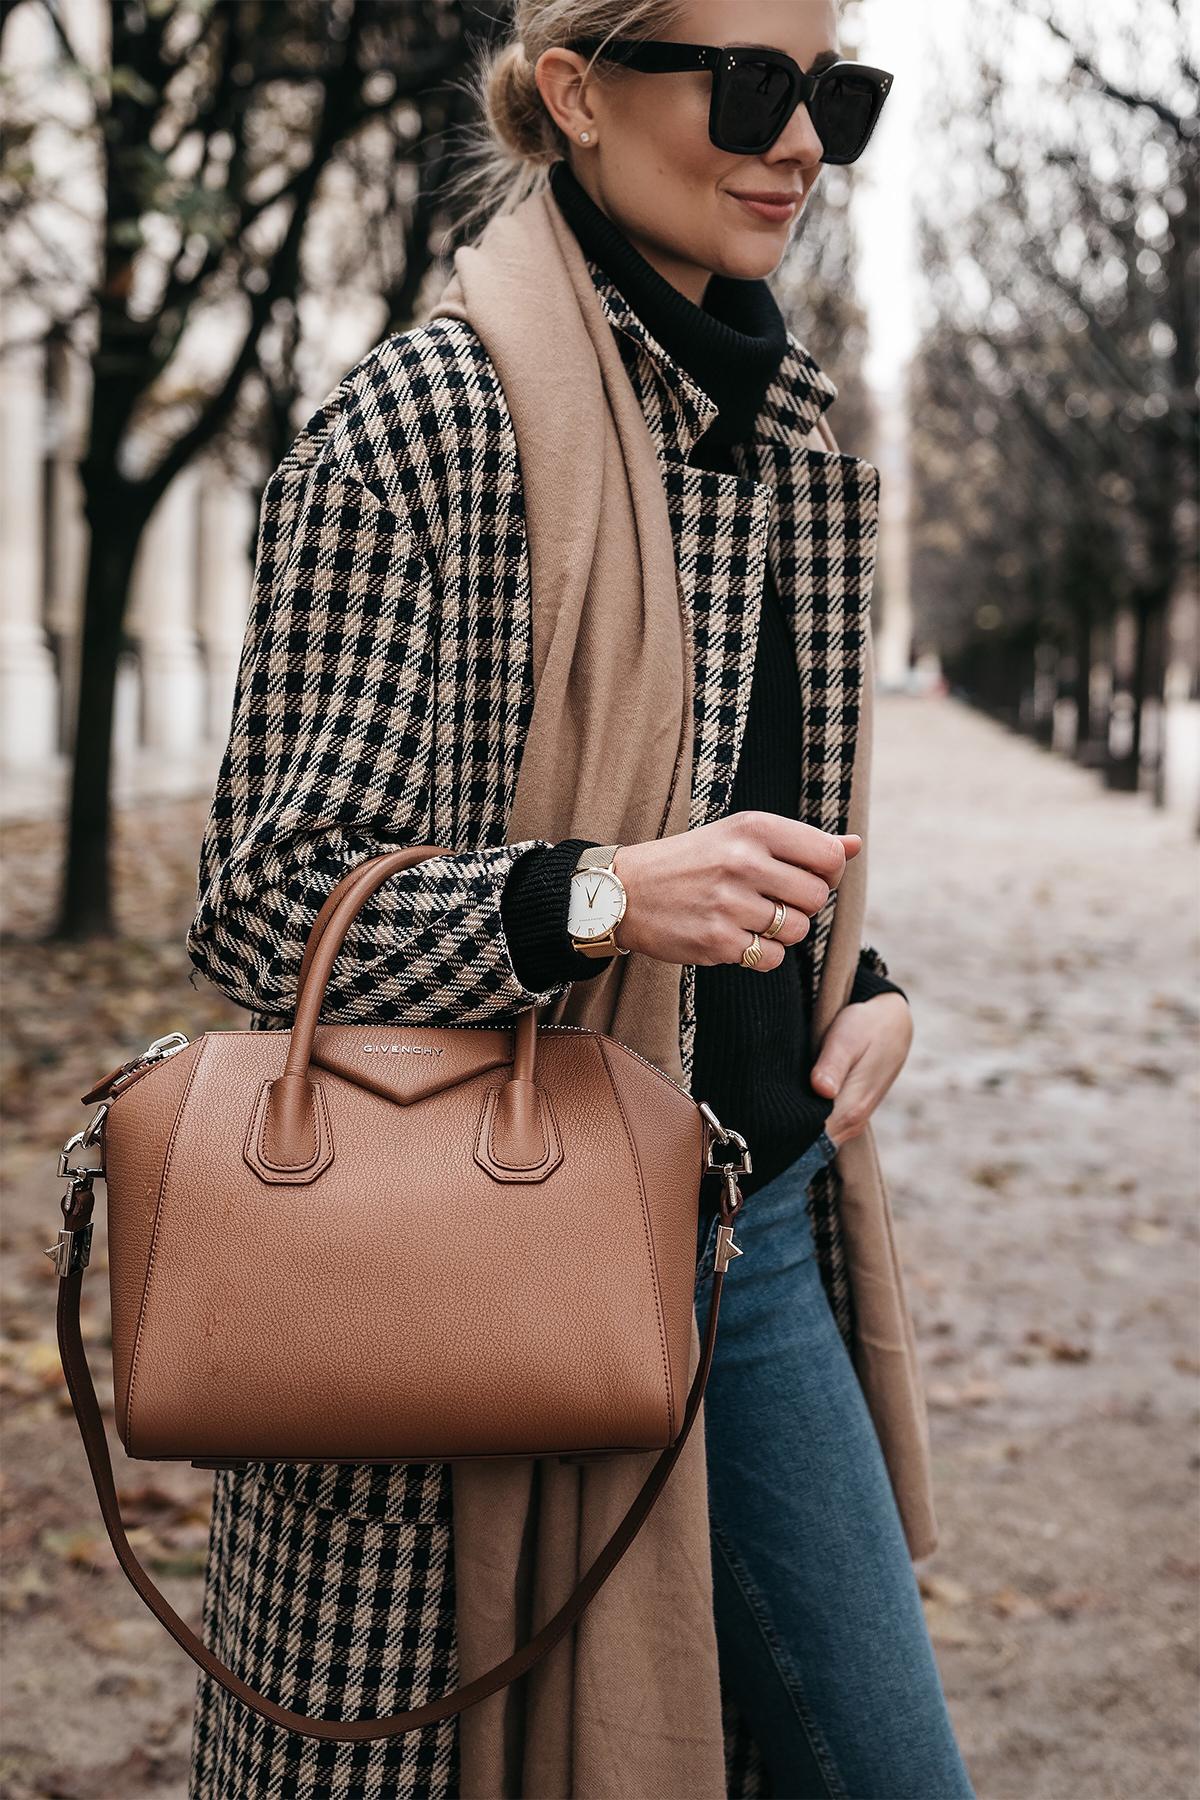 ebd15938211b Blonde Woman Wearing Paris France Fall Plaid Check Coat Black Turtleneck  Sweater Tan Blanket Scarf Givenchy